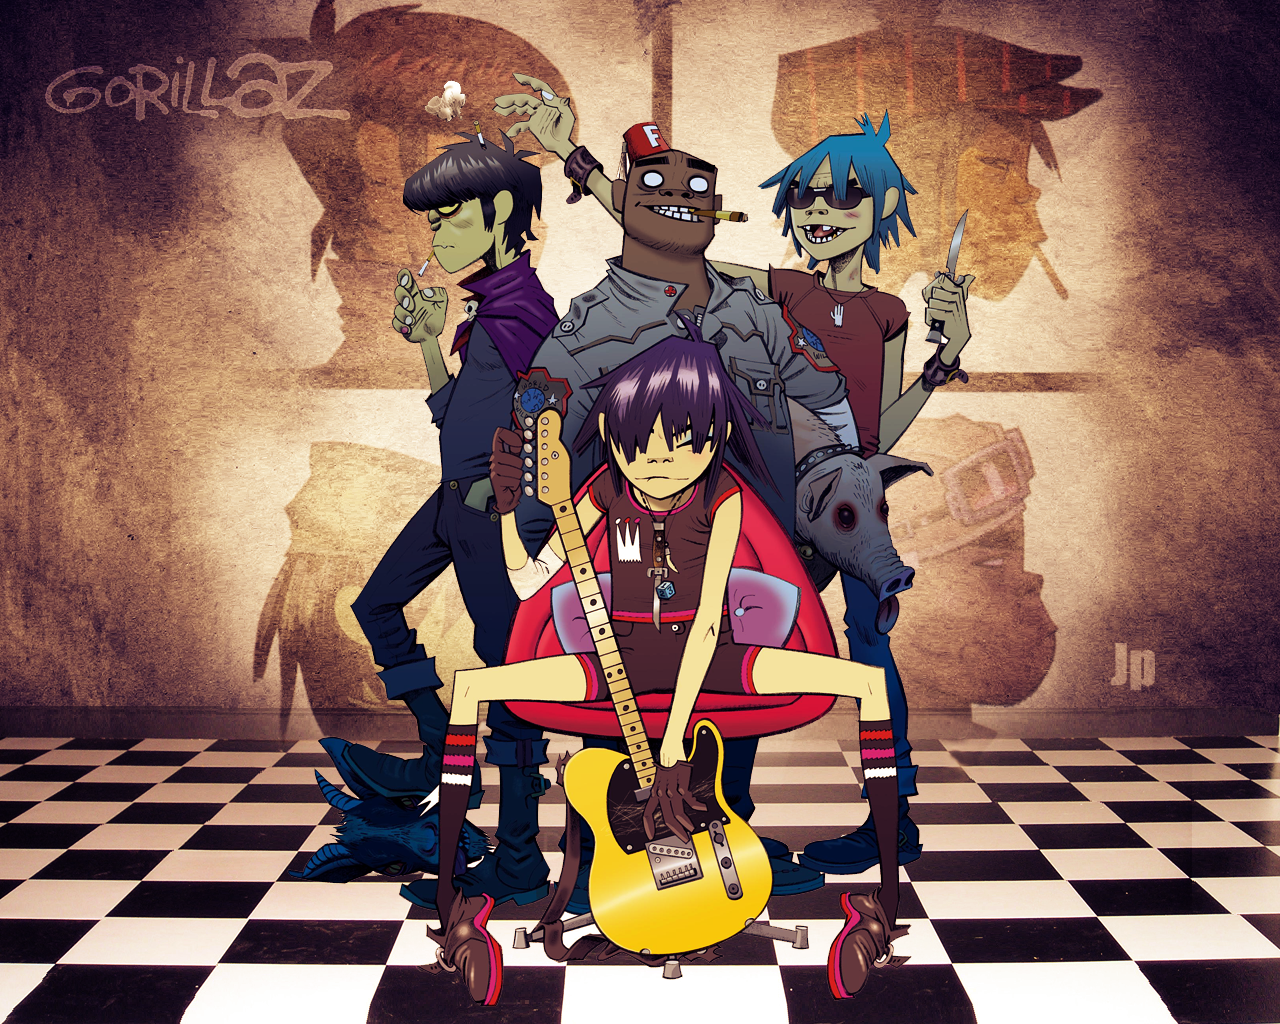 Gorillaz a banda Gorillaz_Wallpaper_by_Jp182